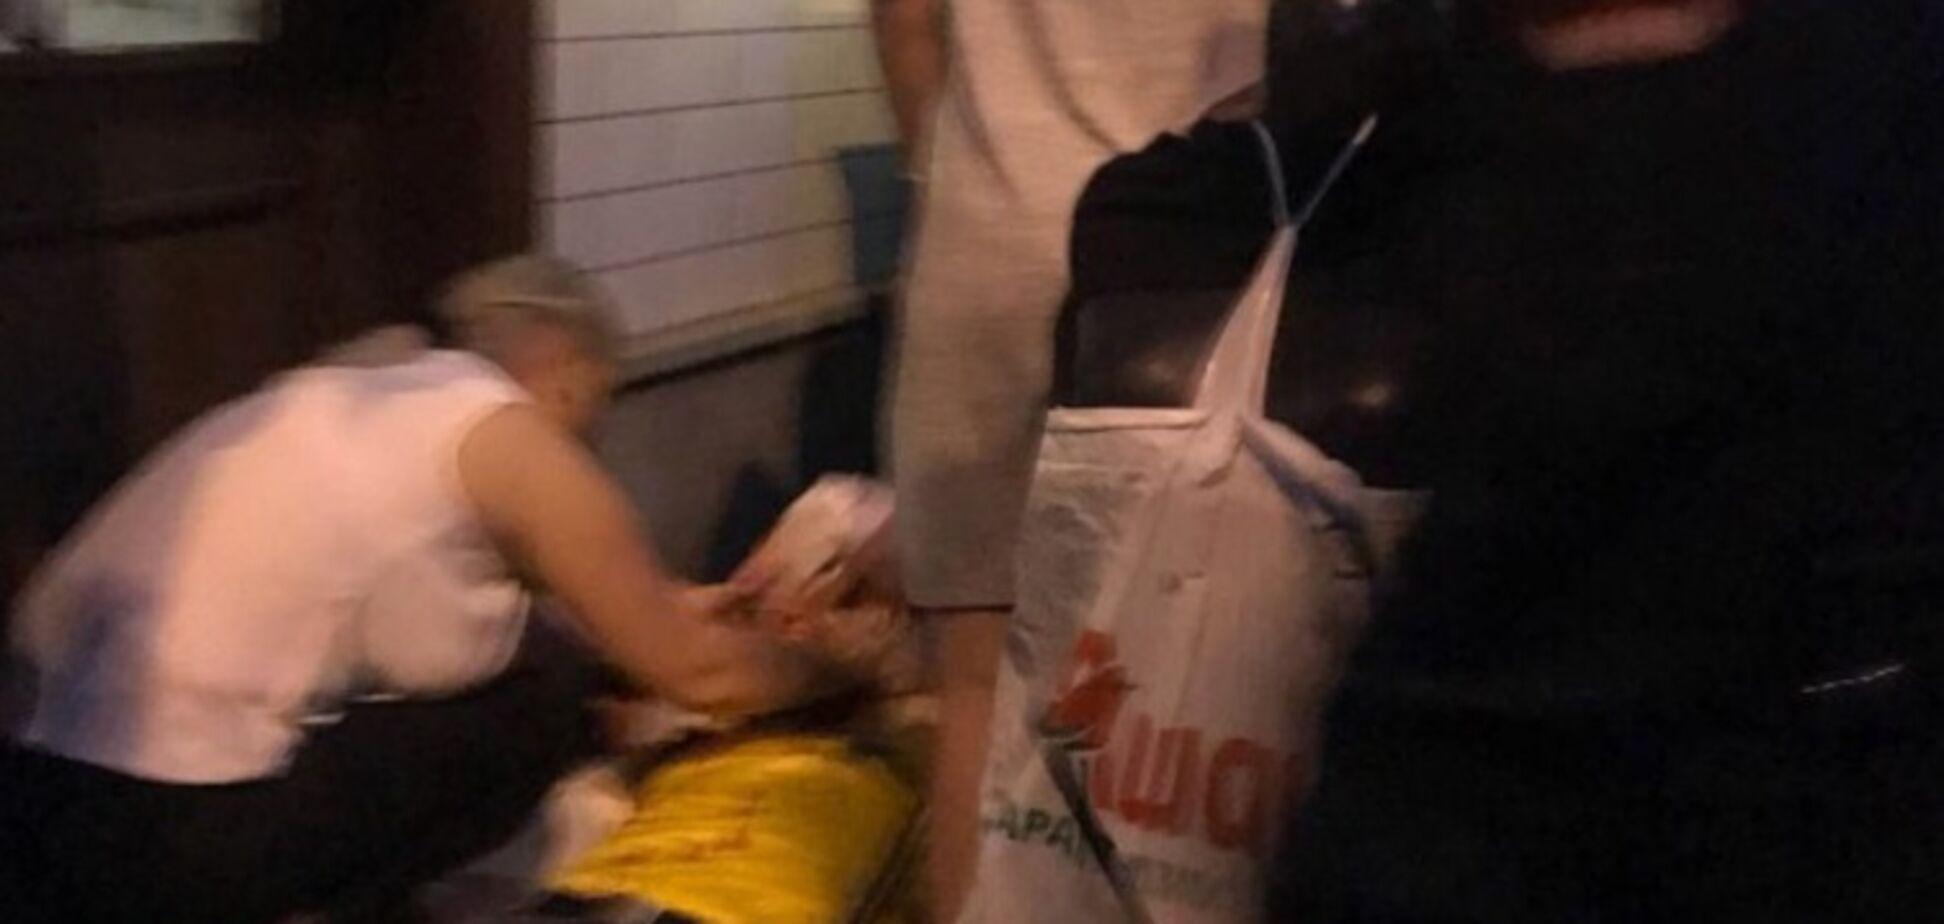 'Непонятно, жив или нет': россиянин жестоко избил шведского фаната